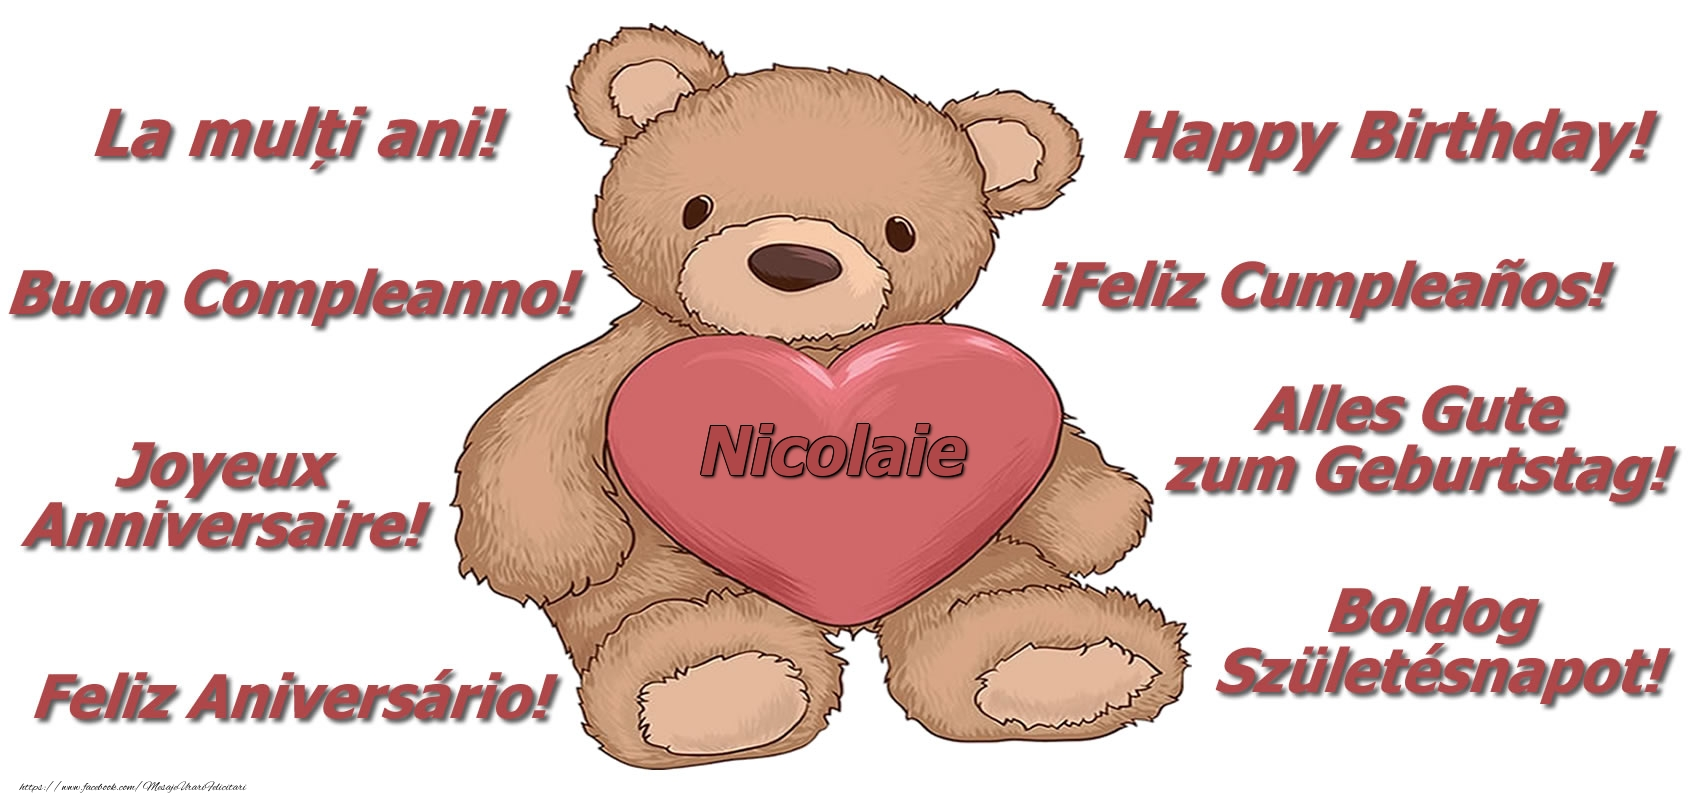 Felicitari de zi de nastere - La multi ani Nicolaie! - Ursulet